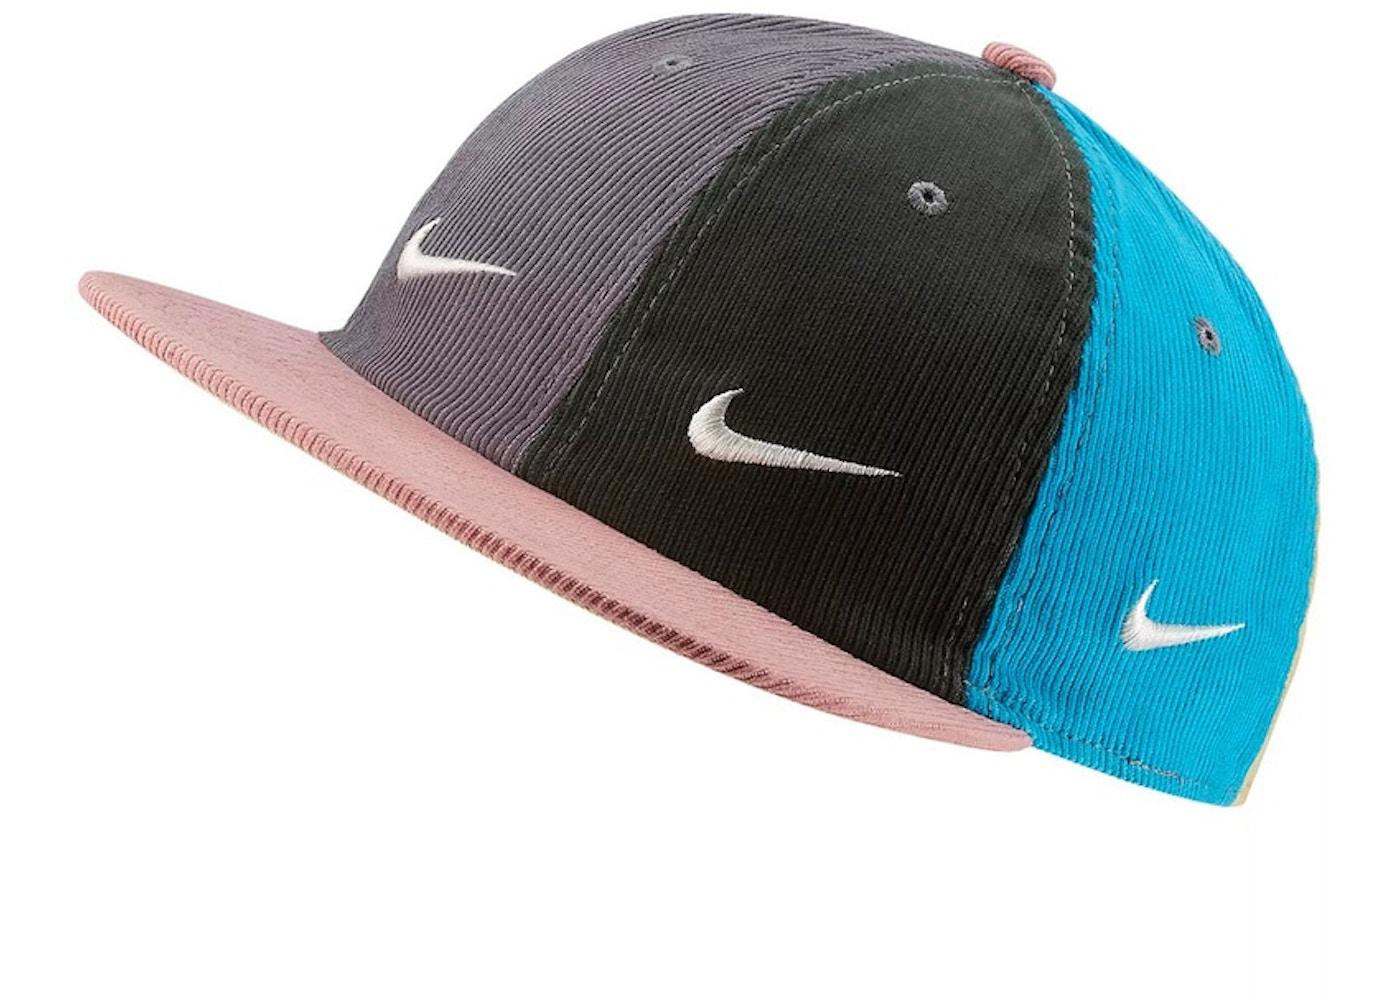 4da2aadd8cb Buy   Sell Nike Apparel Streetwear